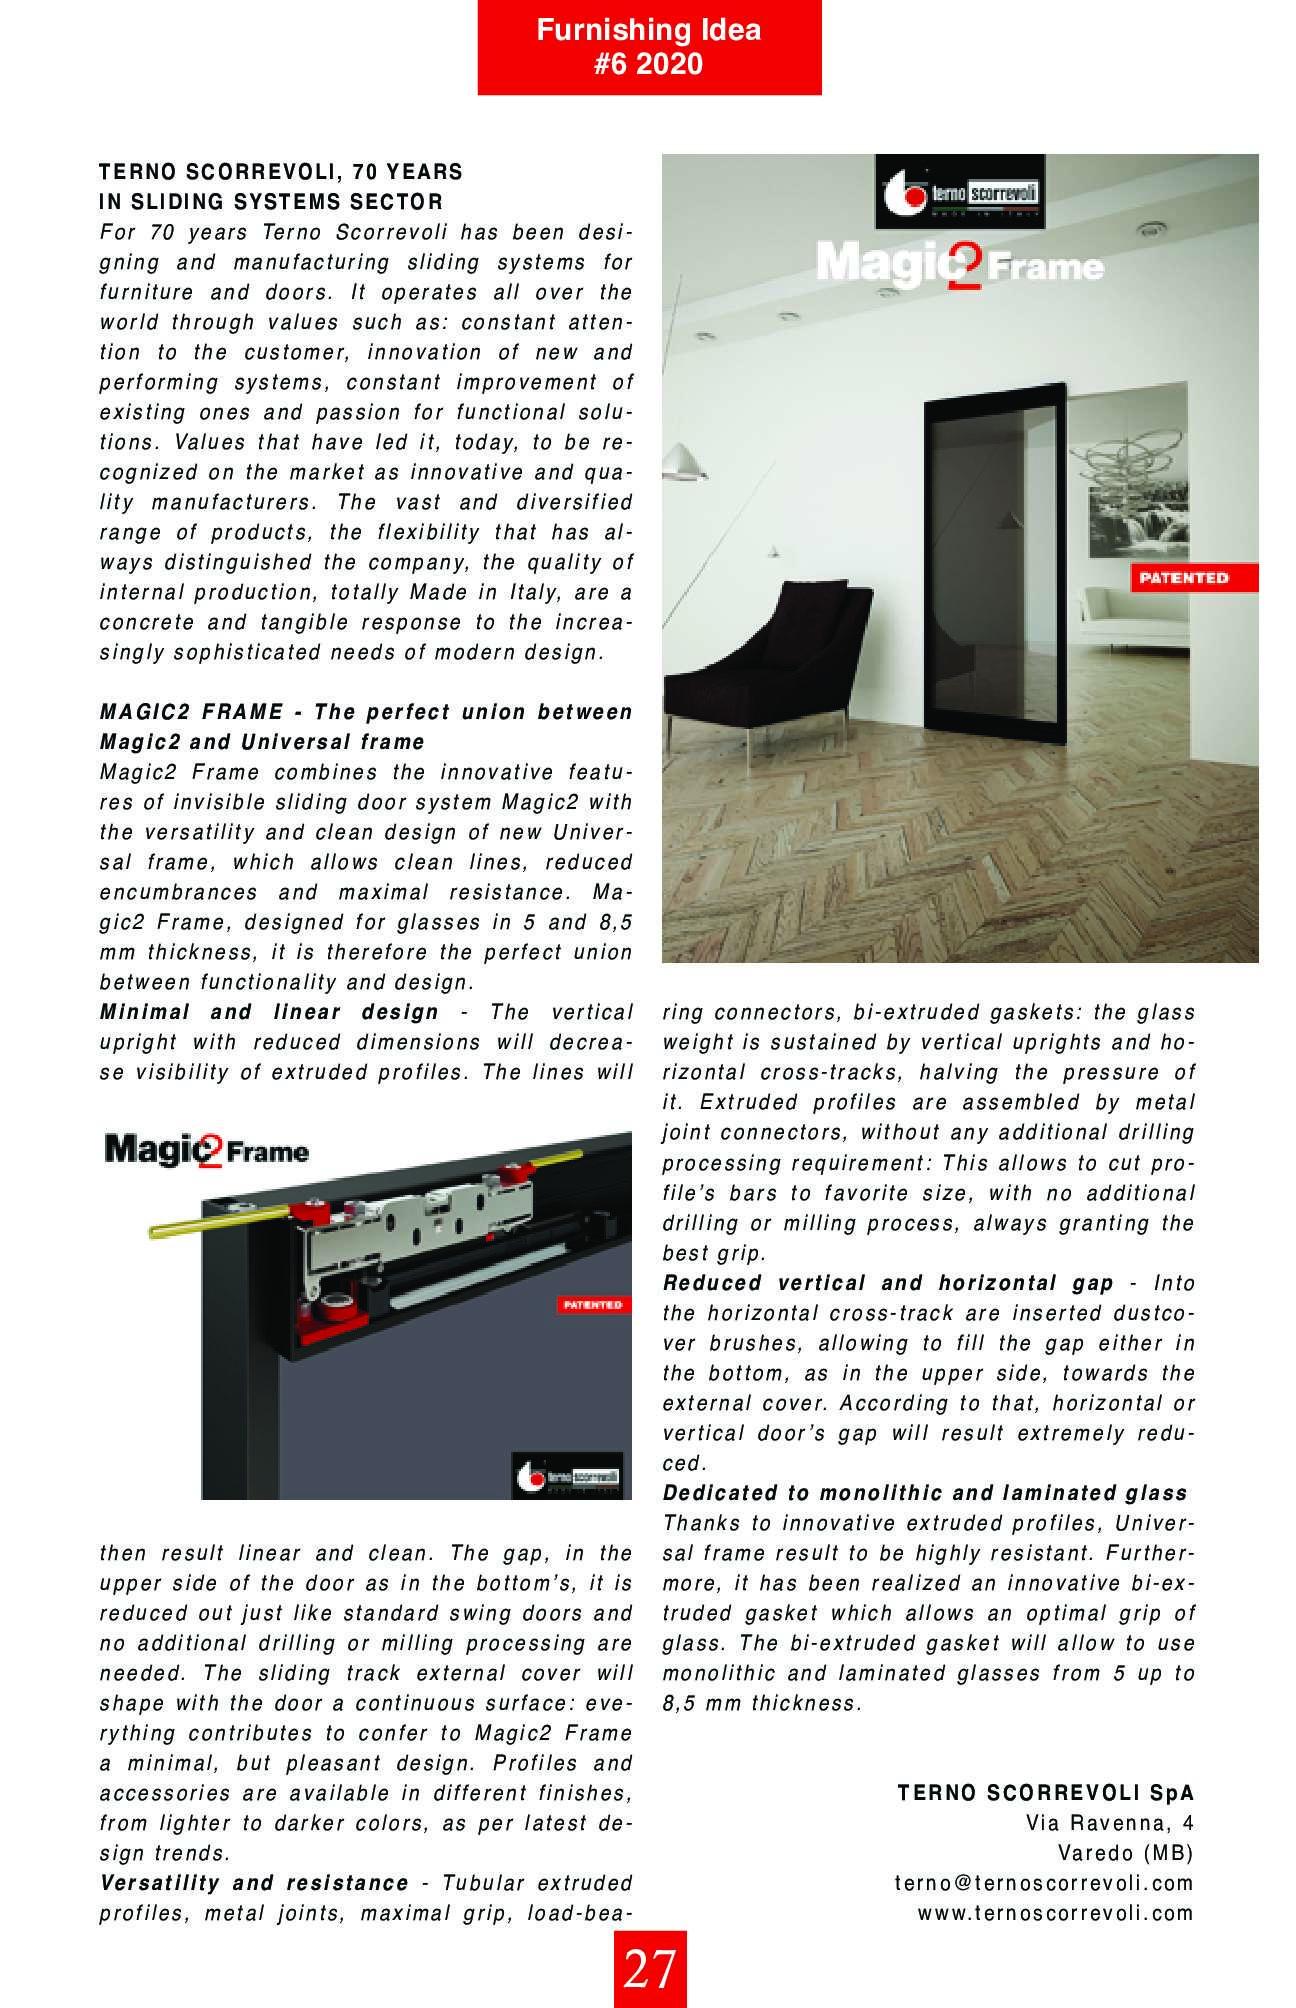 furnishingidea-6-2020_journal_22_026.jpg